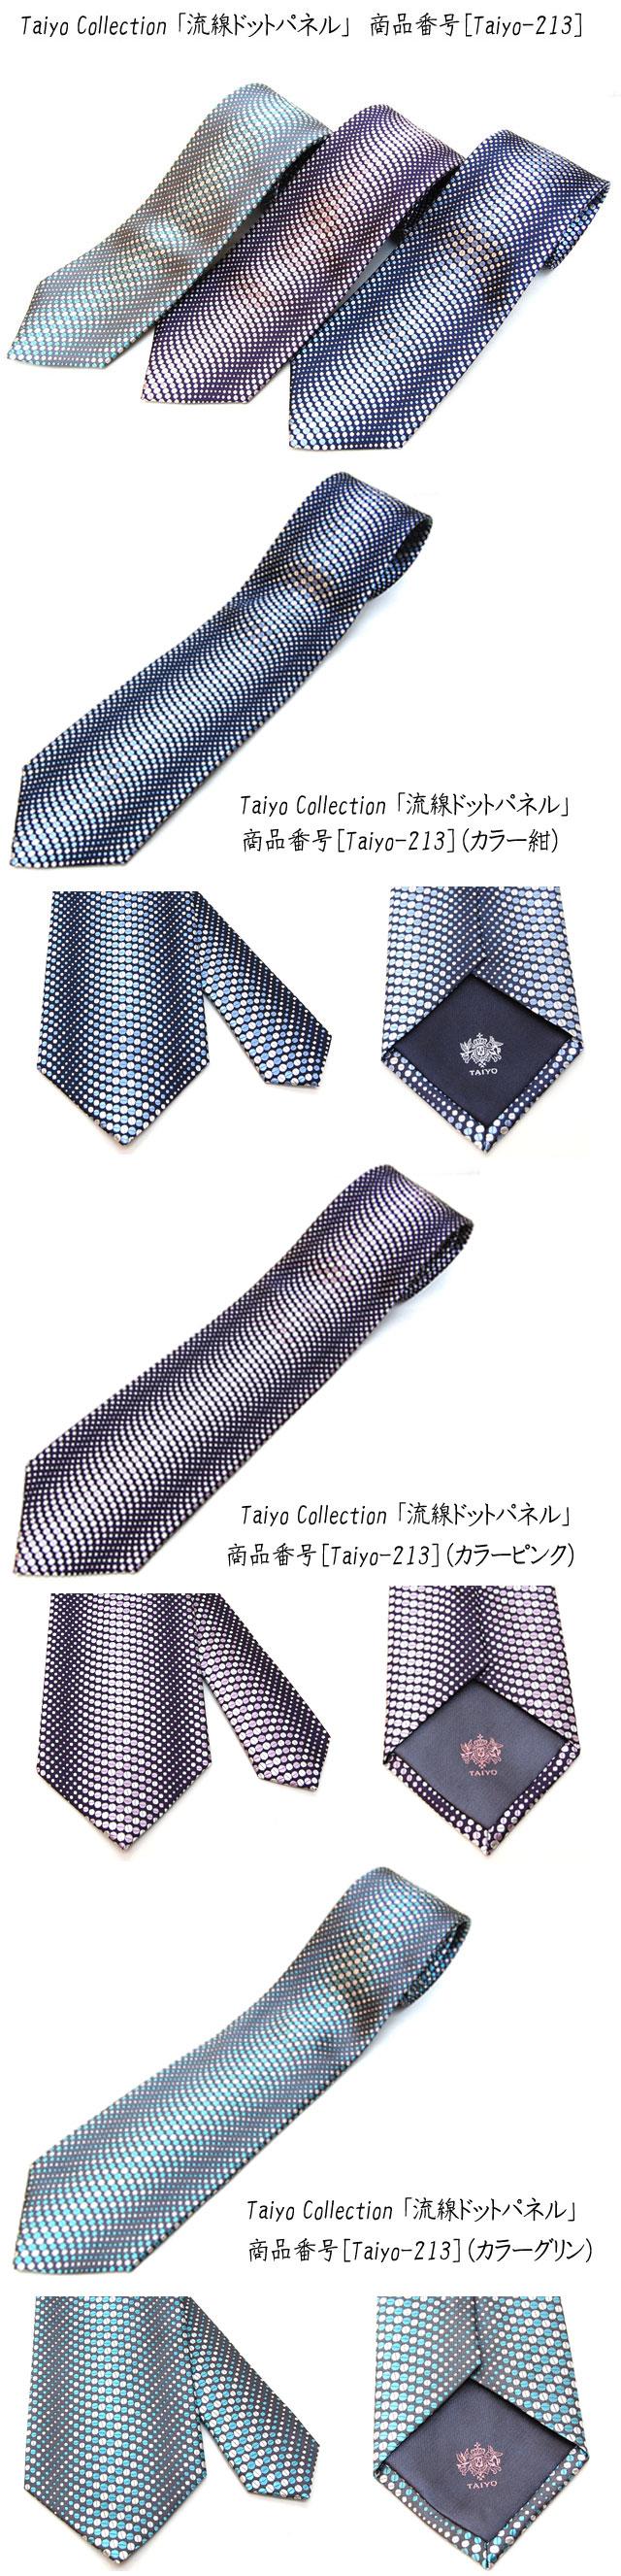 taiyo-213-2